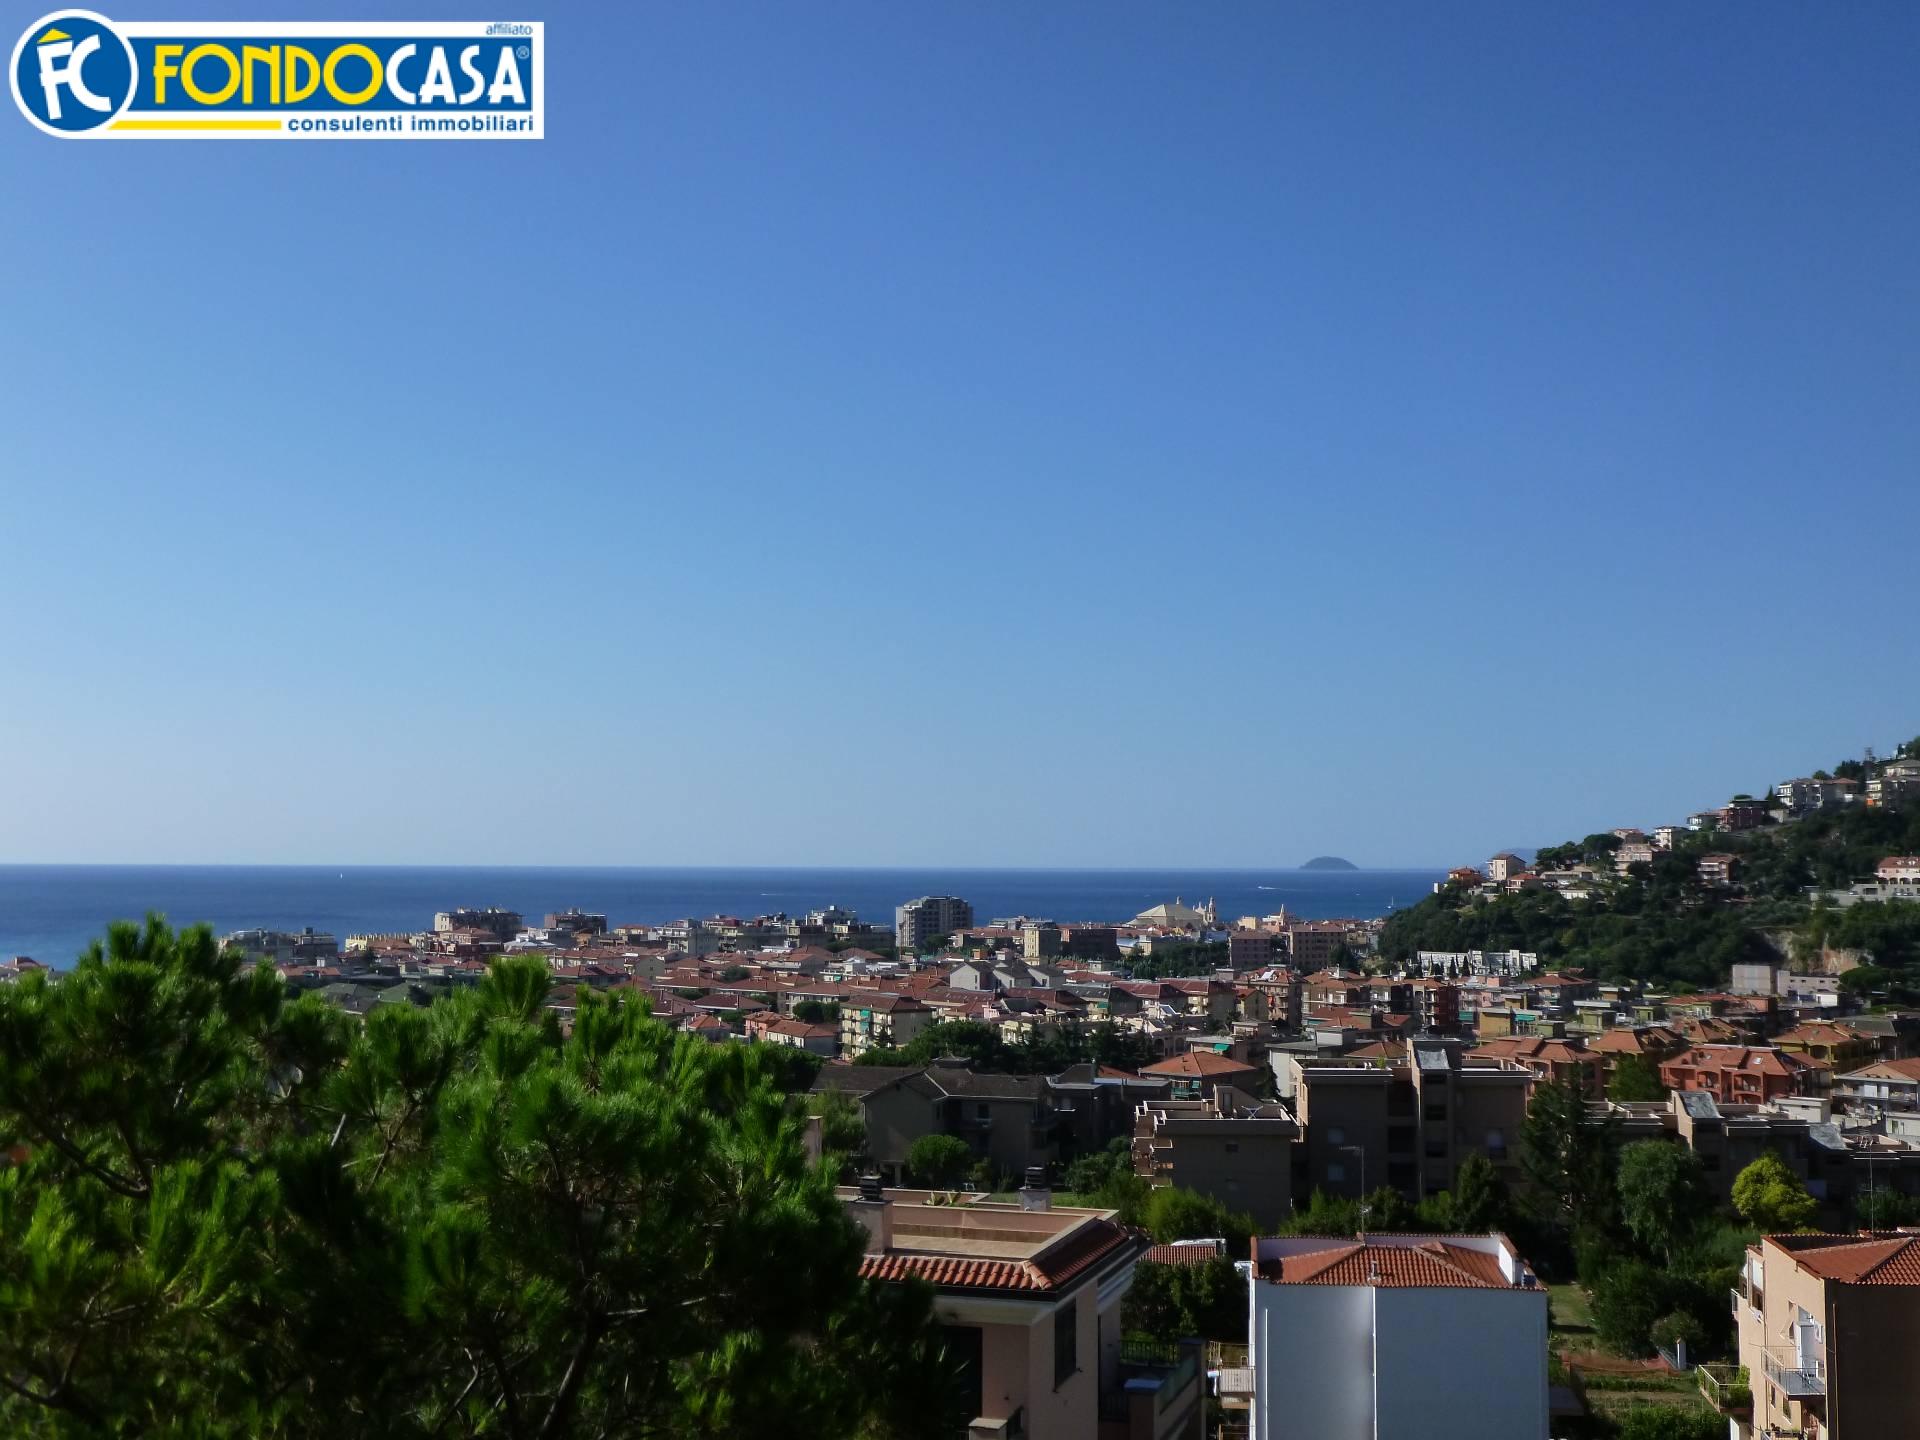 Bilocale Pietra Ligure Zona Via Morelli 3